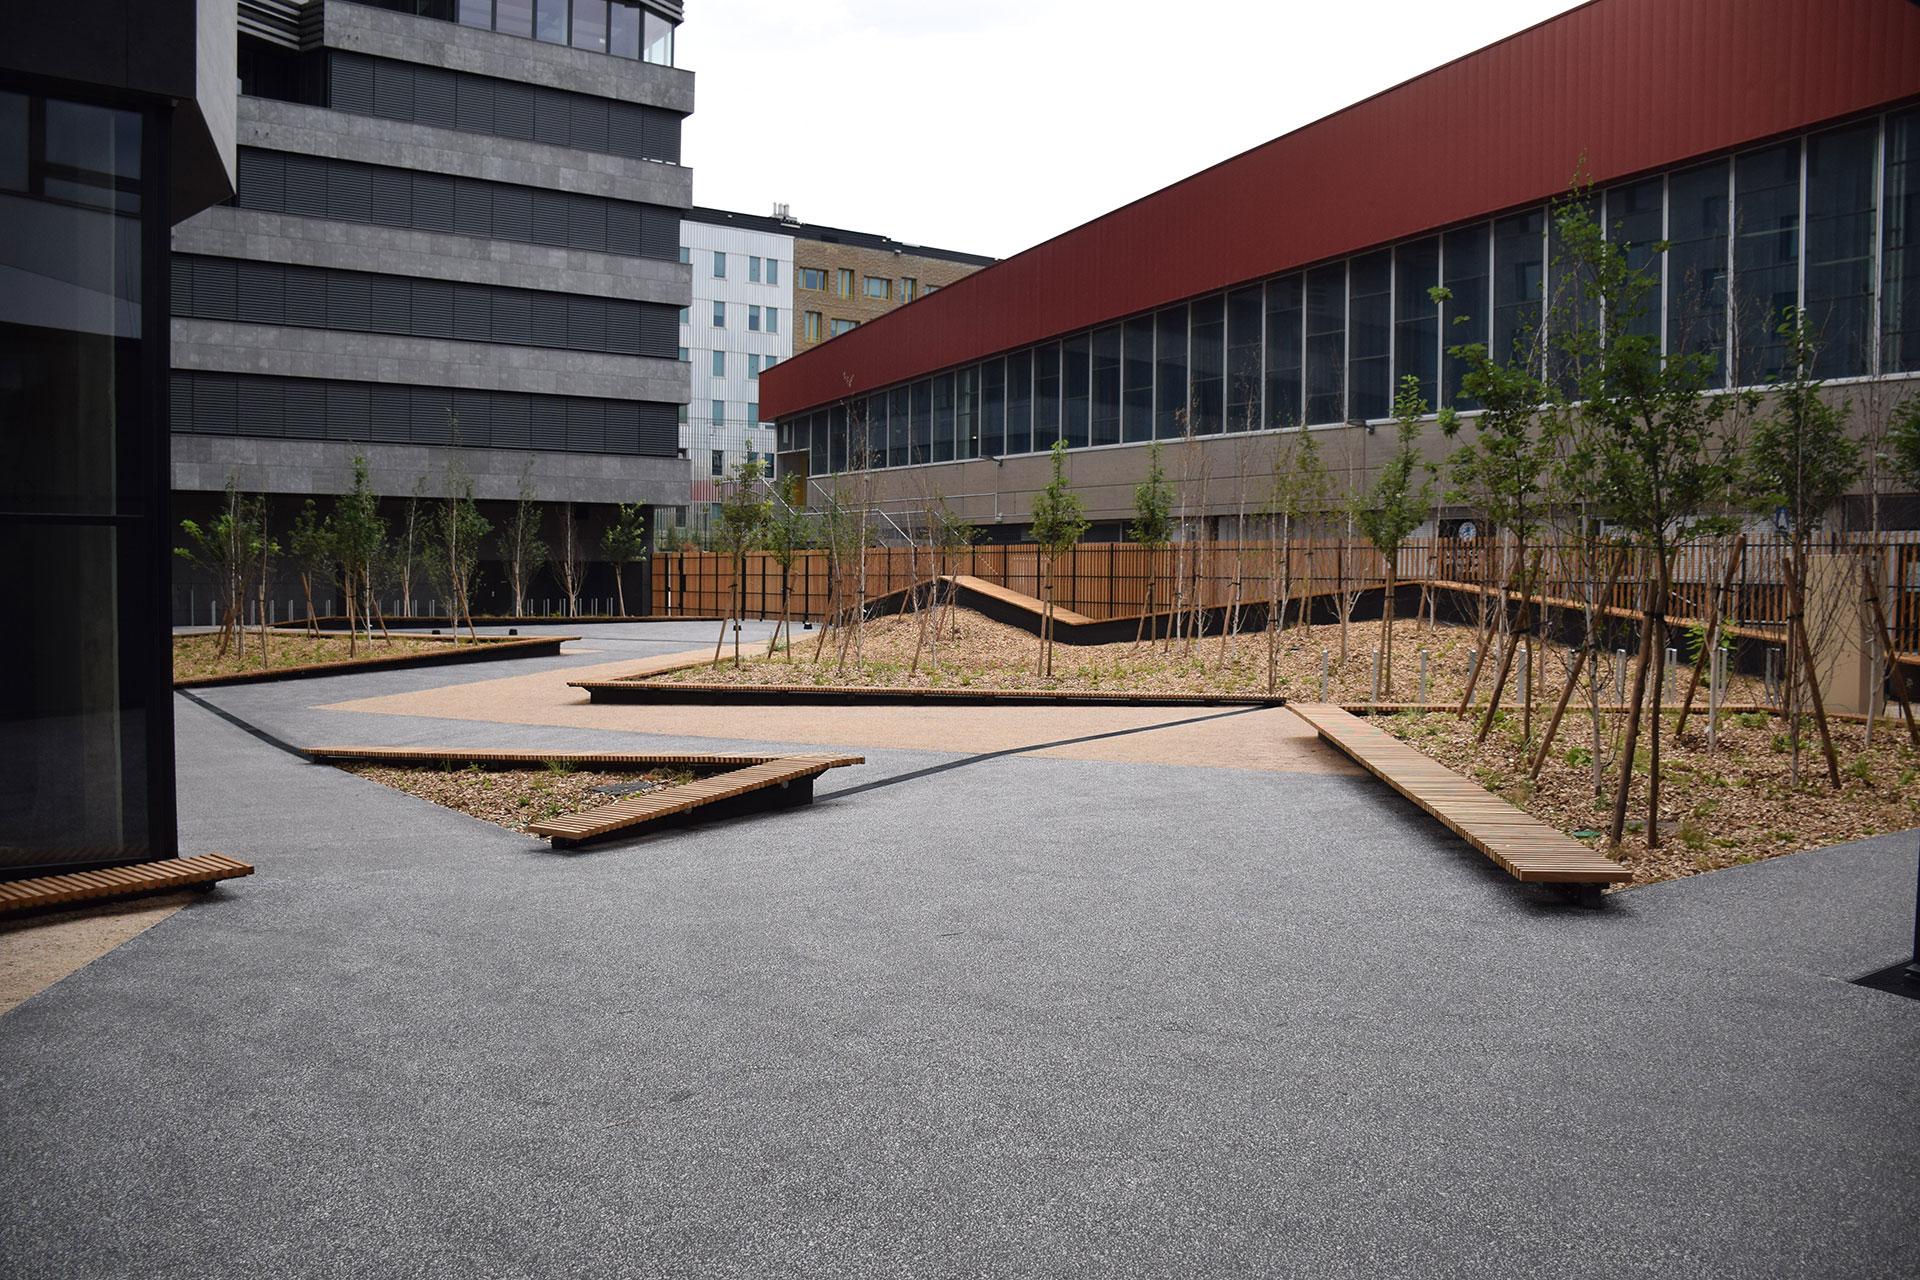 The Hikari Garden